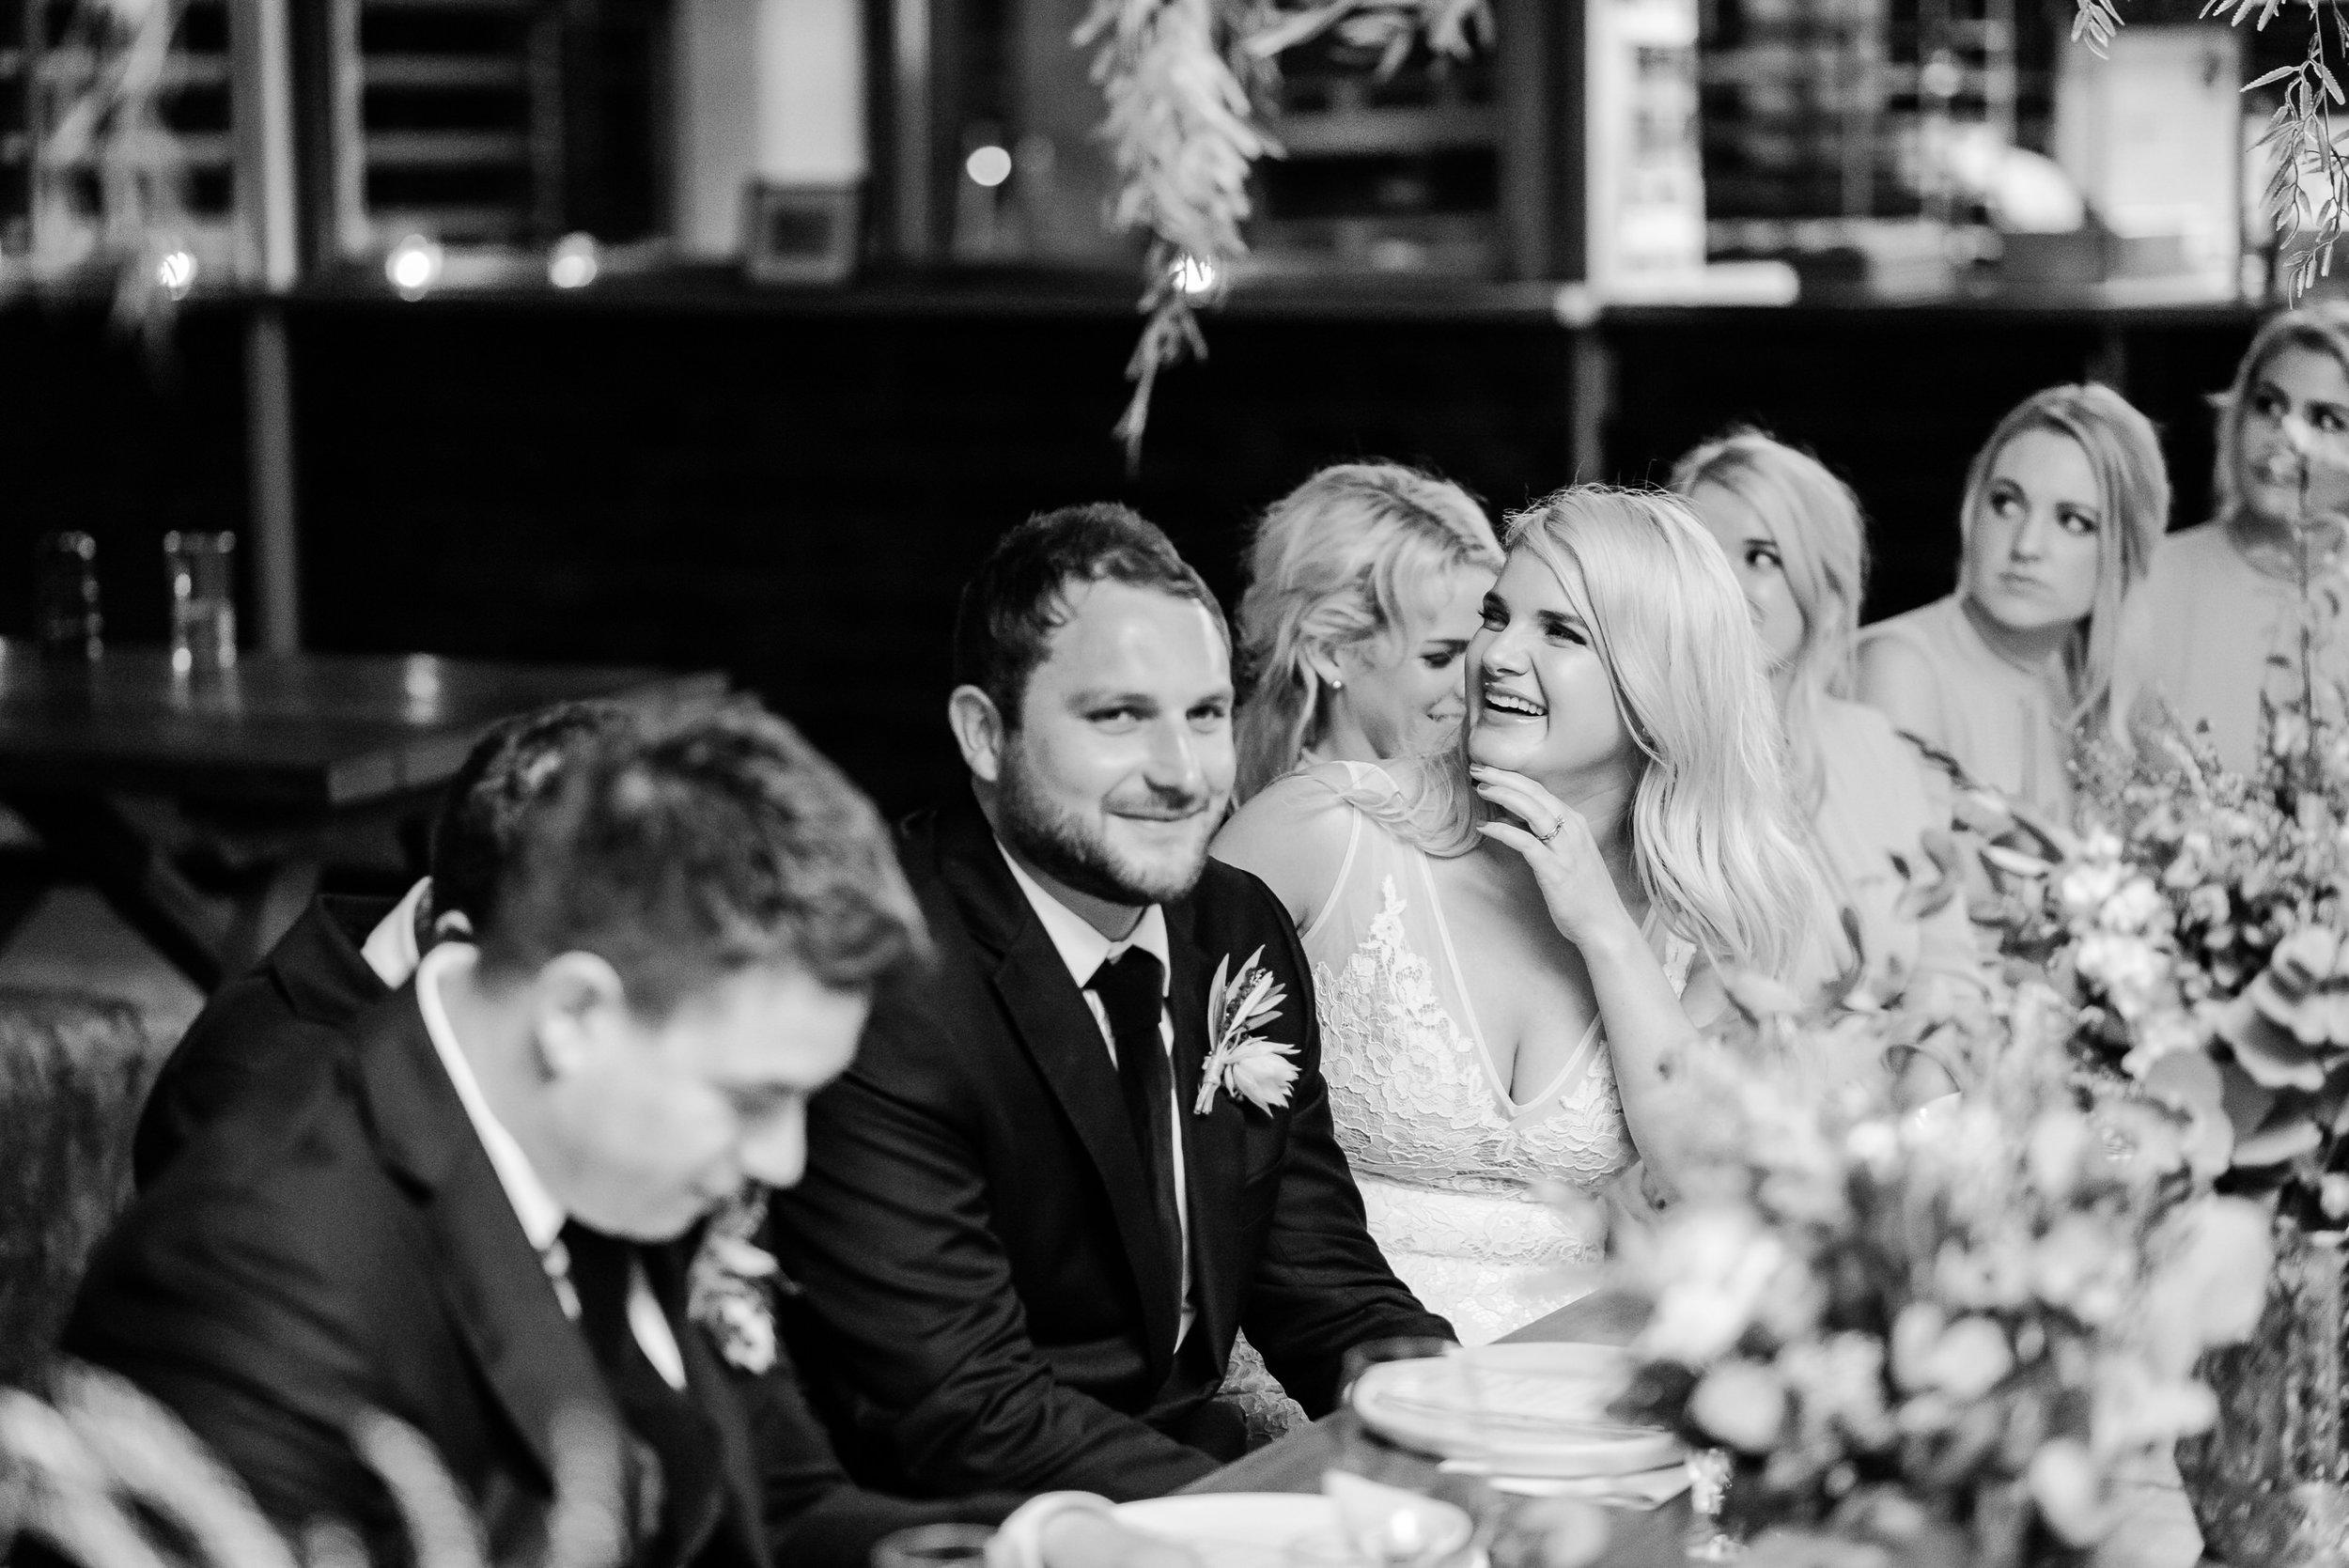 Justin_And_Jim_Photography_Byron_Bay_Wedding100.JPG